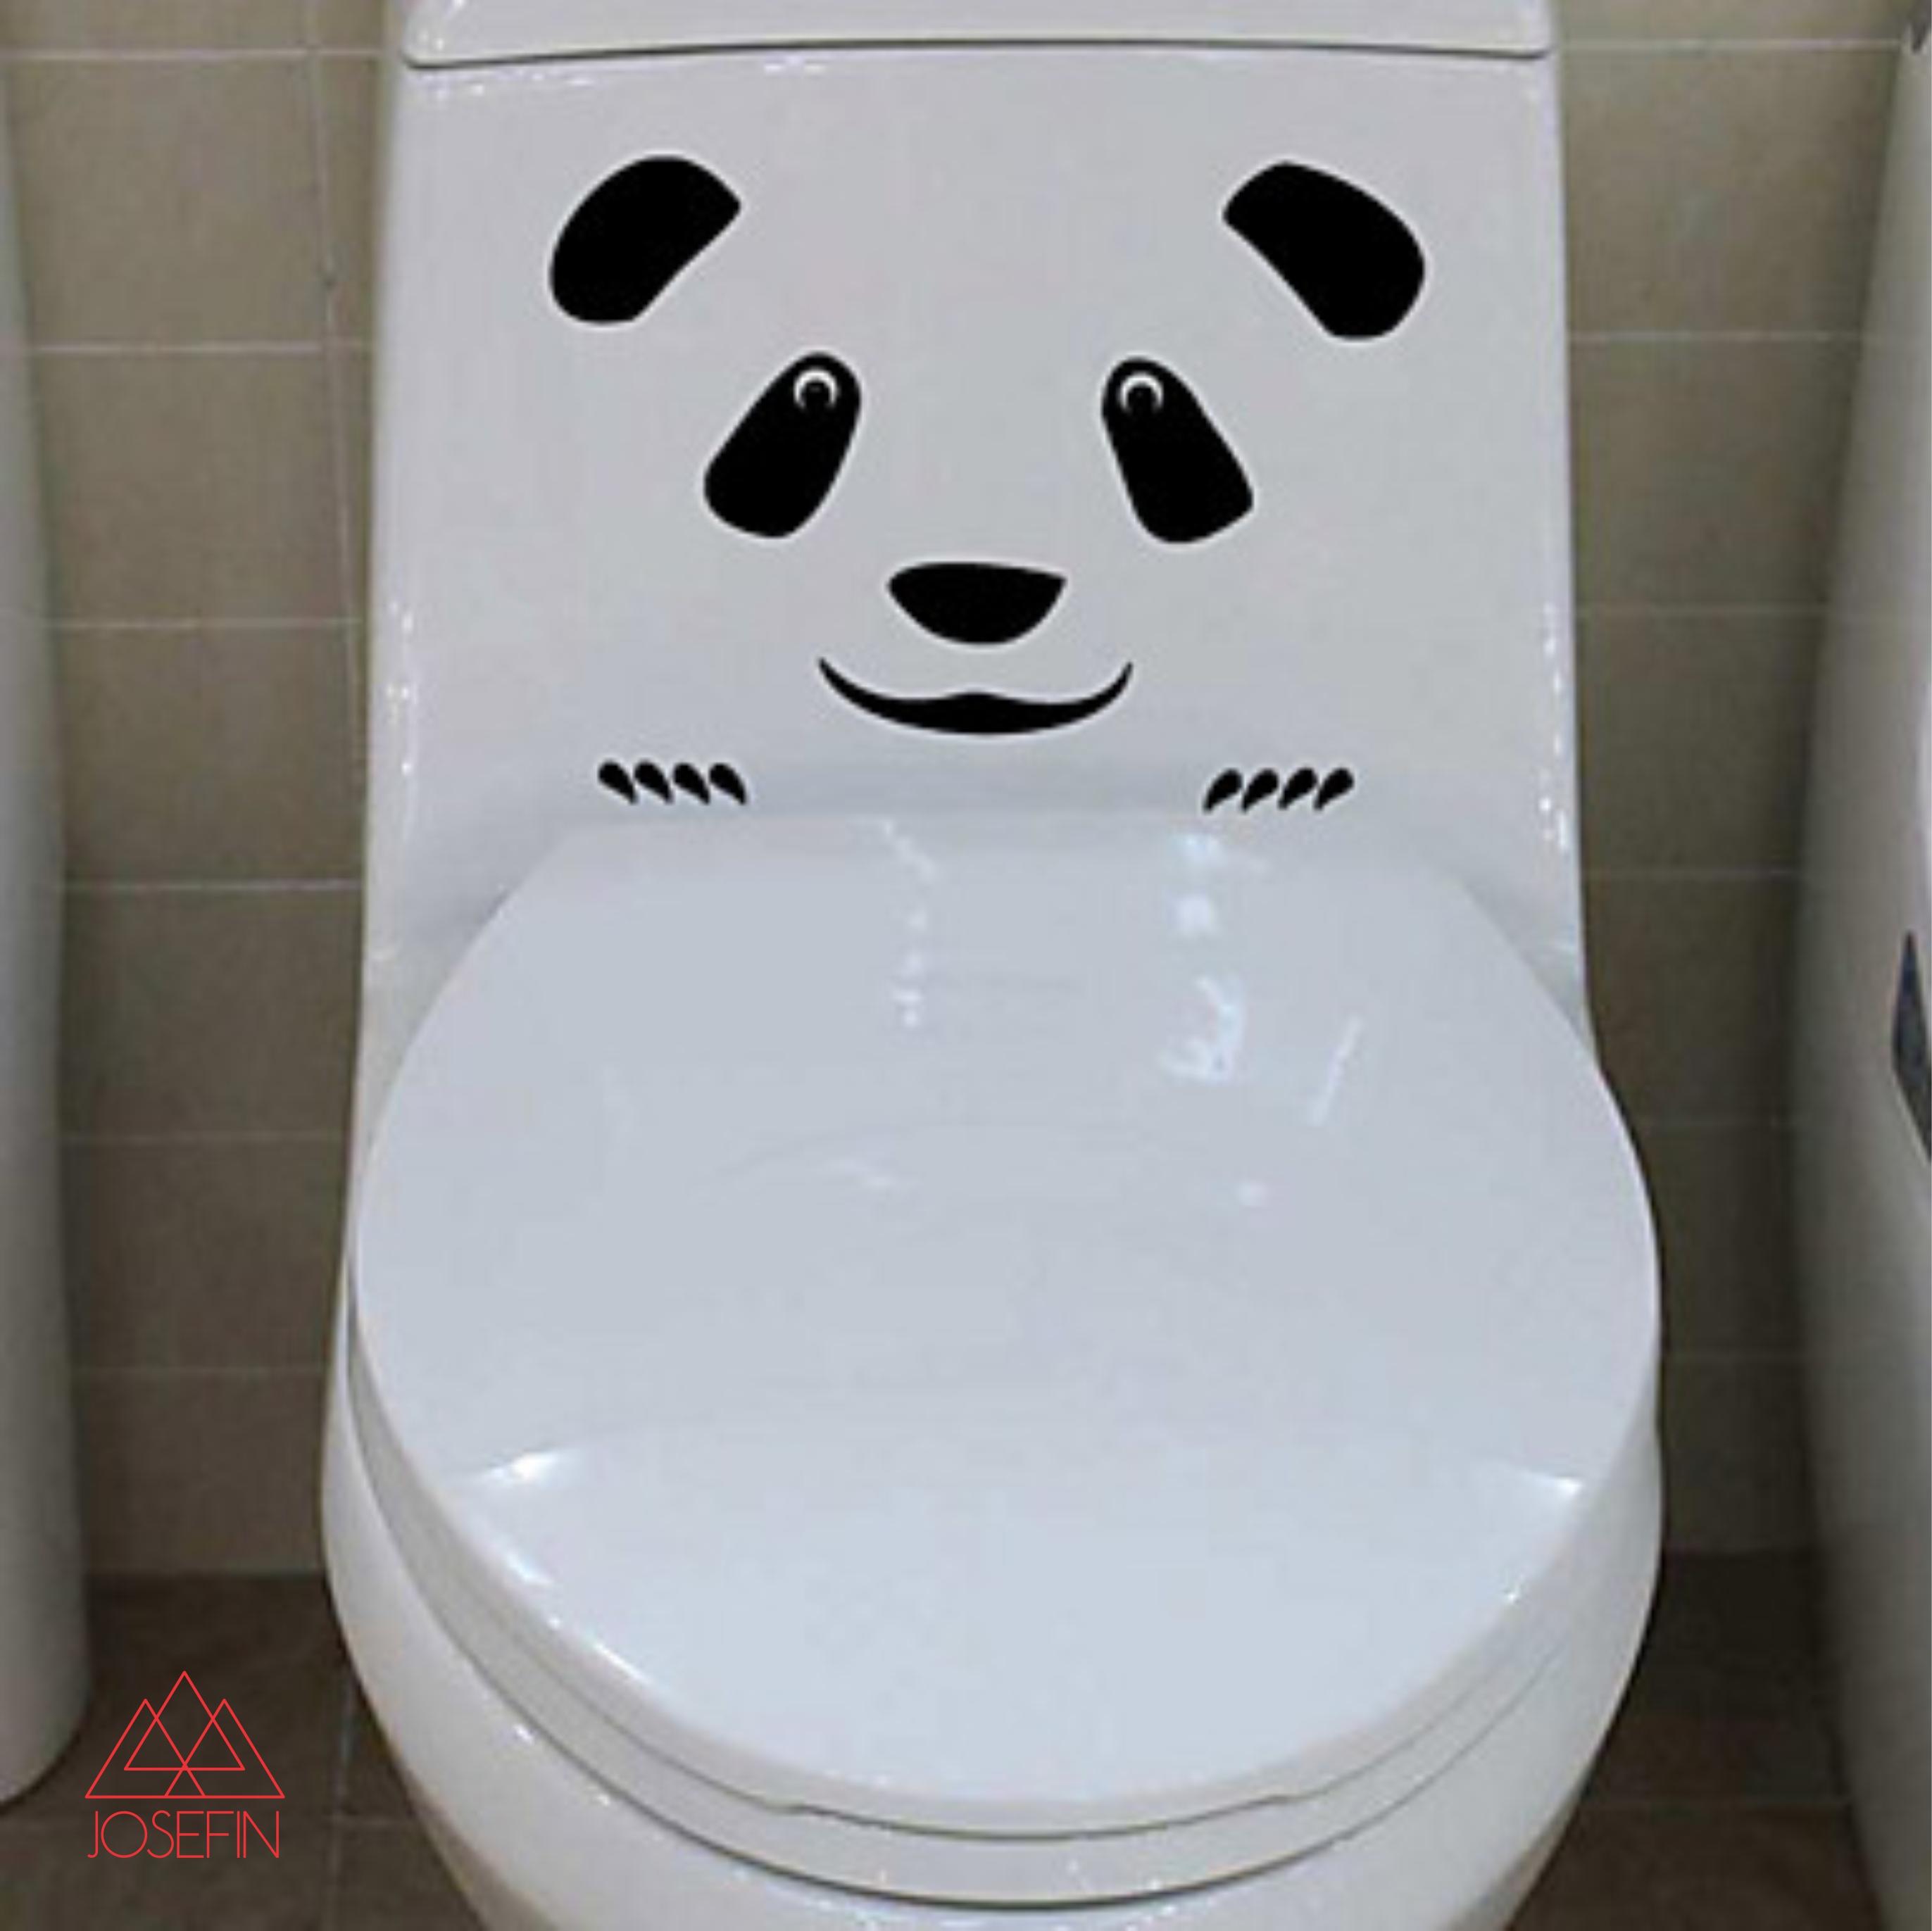 Adesivo Sinal Banheiro Panda A0254  Josefin  Elo7 -> Sinal Banheiro Feminino